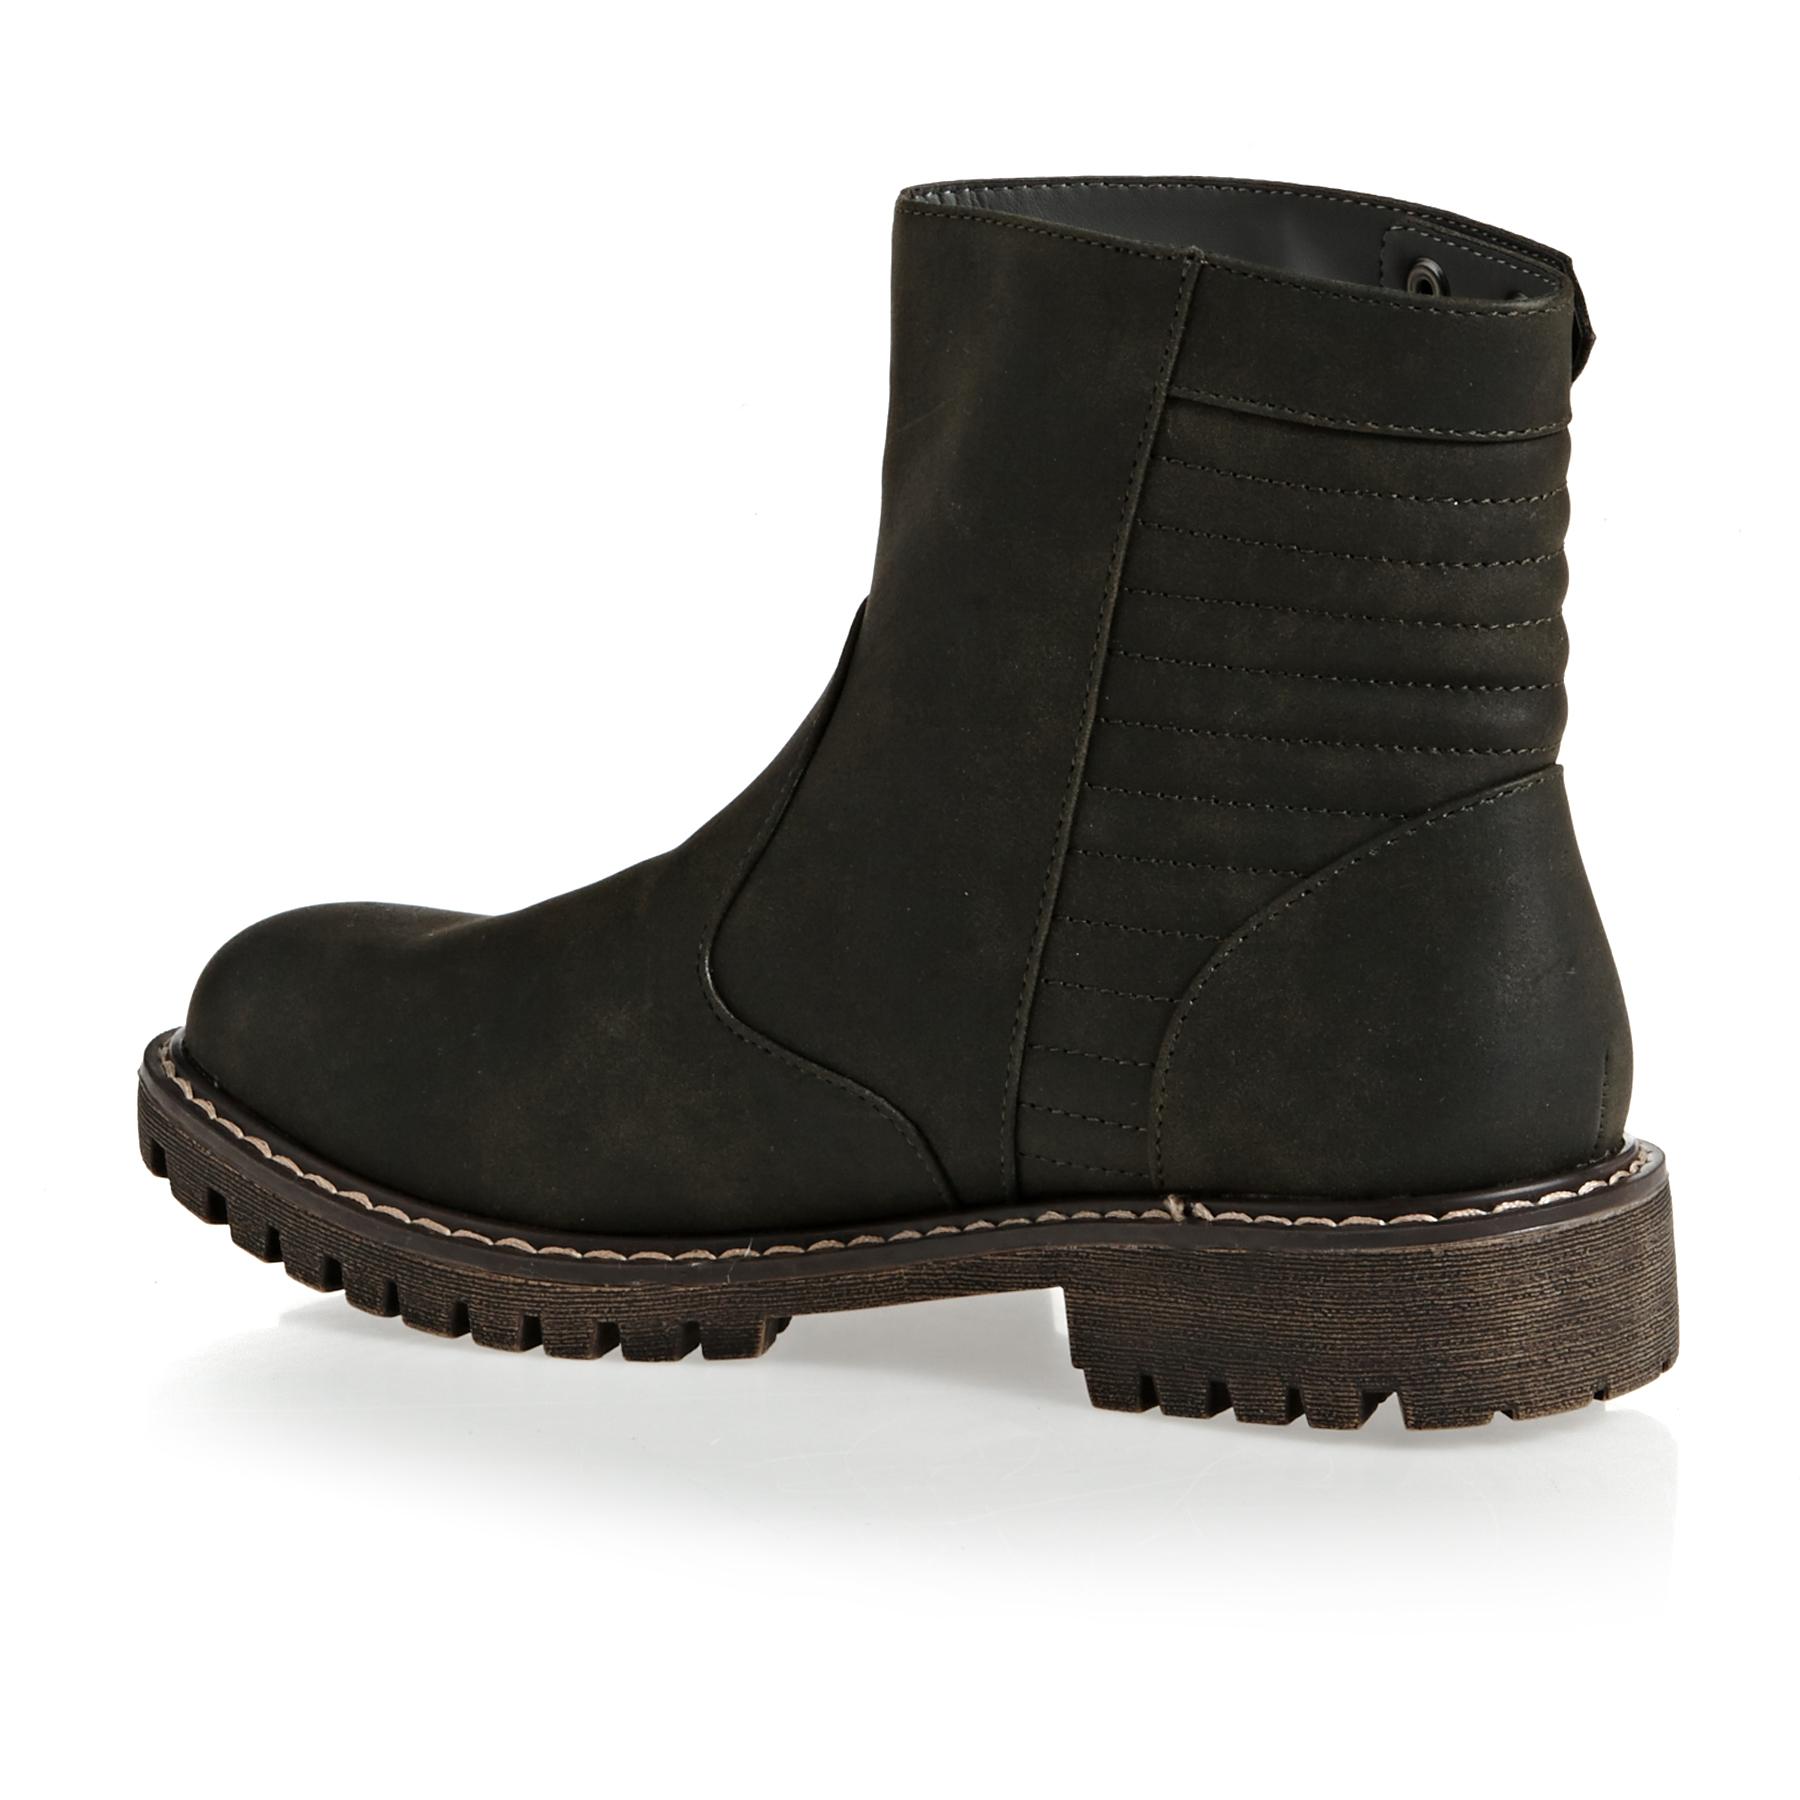 Free Roxy Delivery Margo On Options J Damen Stiefel All Nvmw8n0O